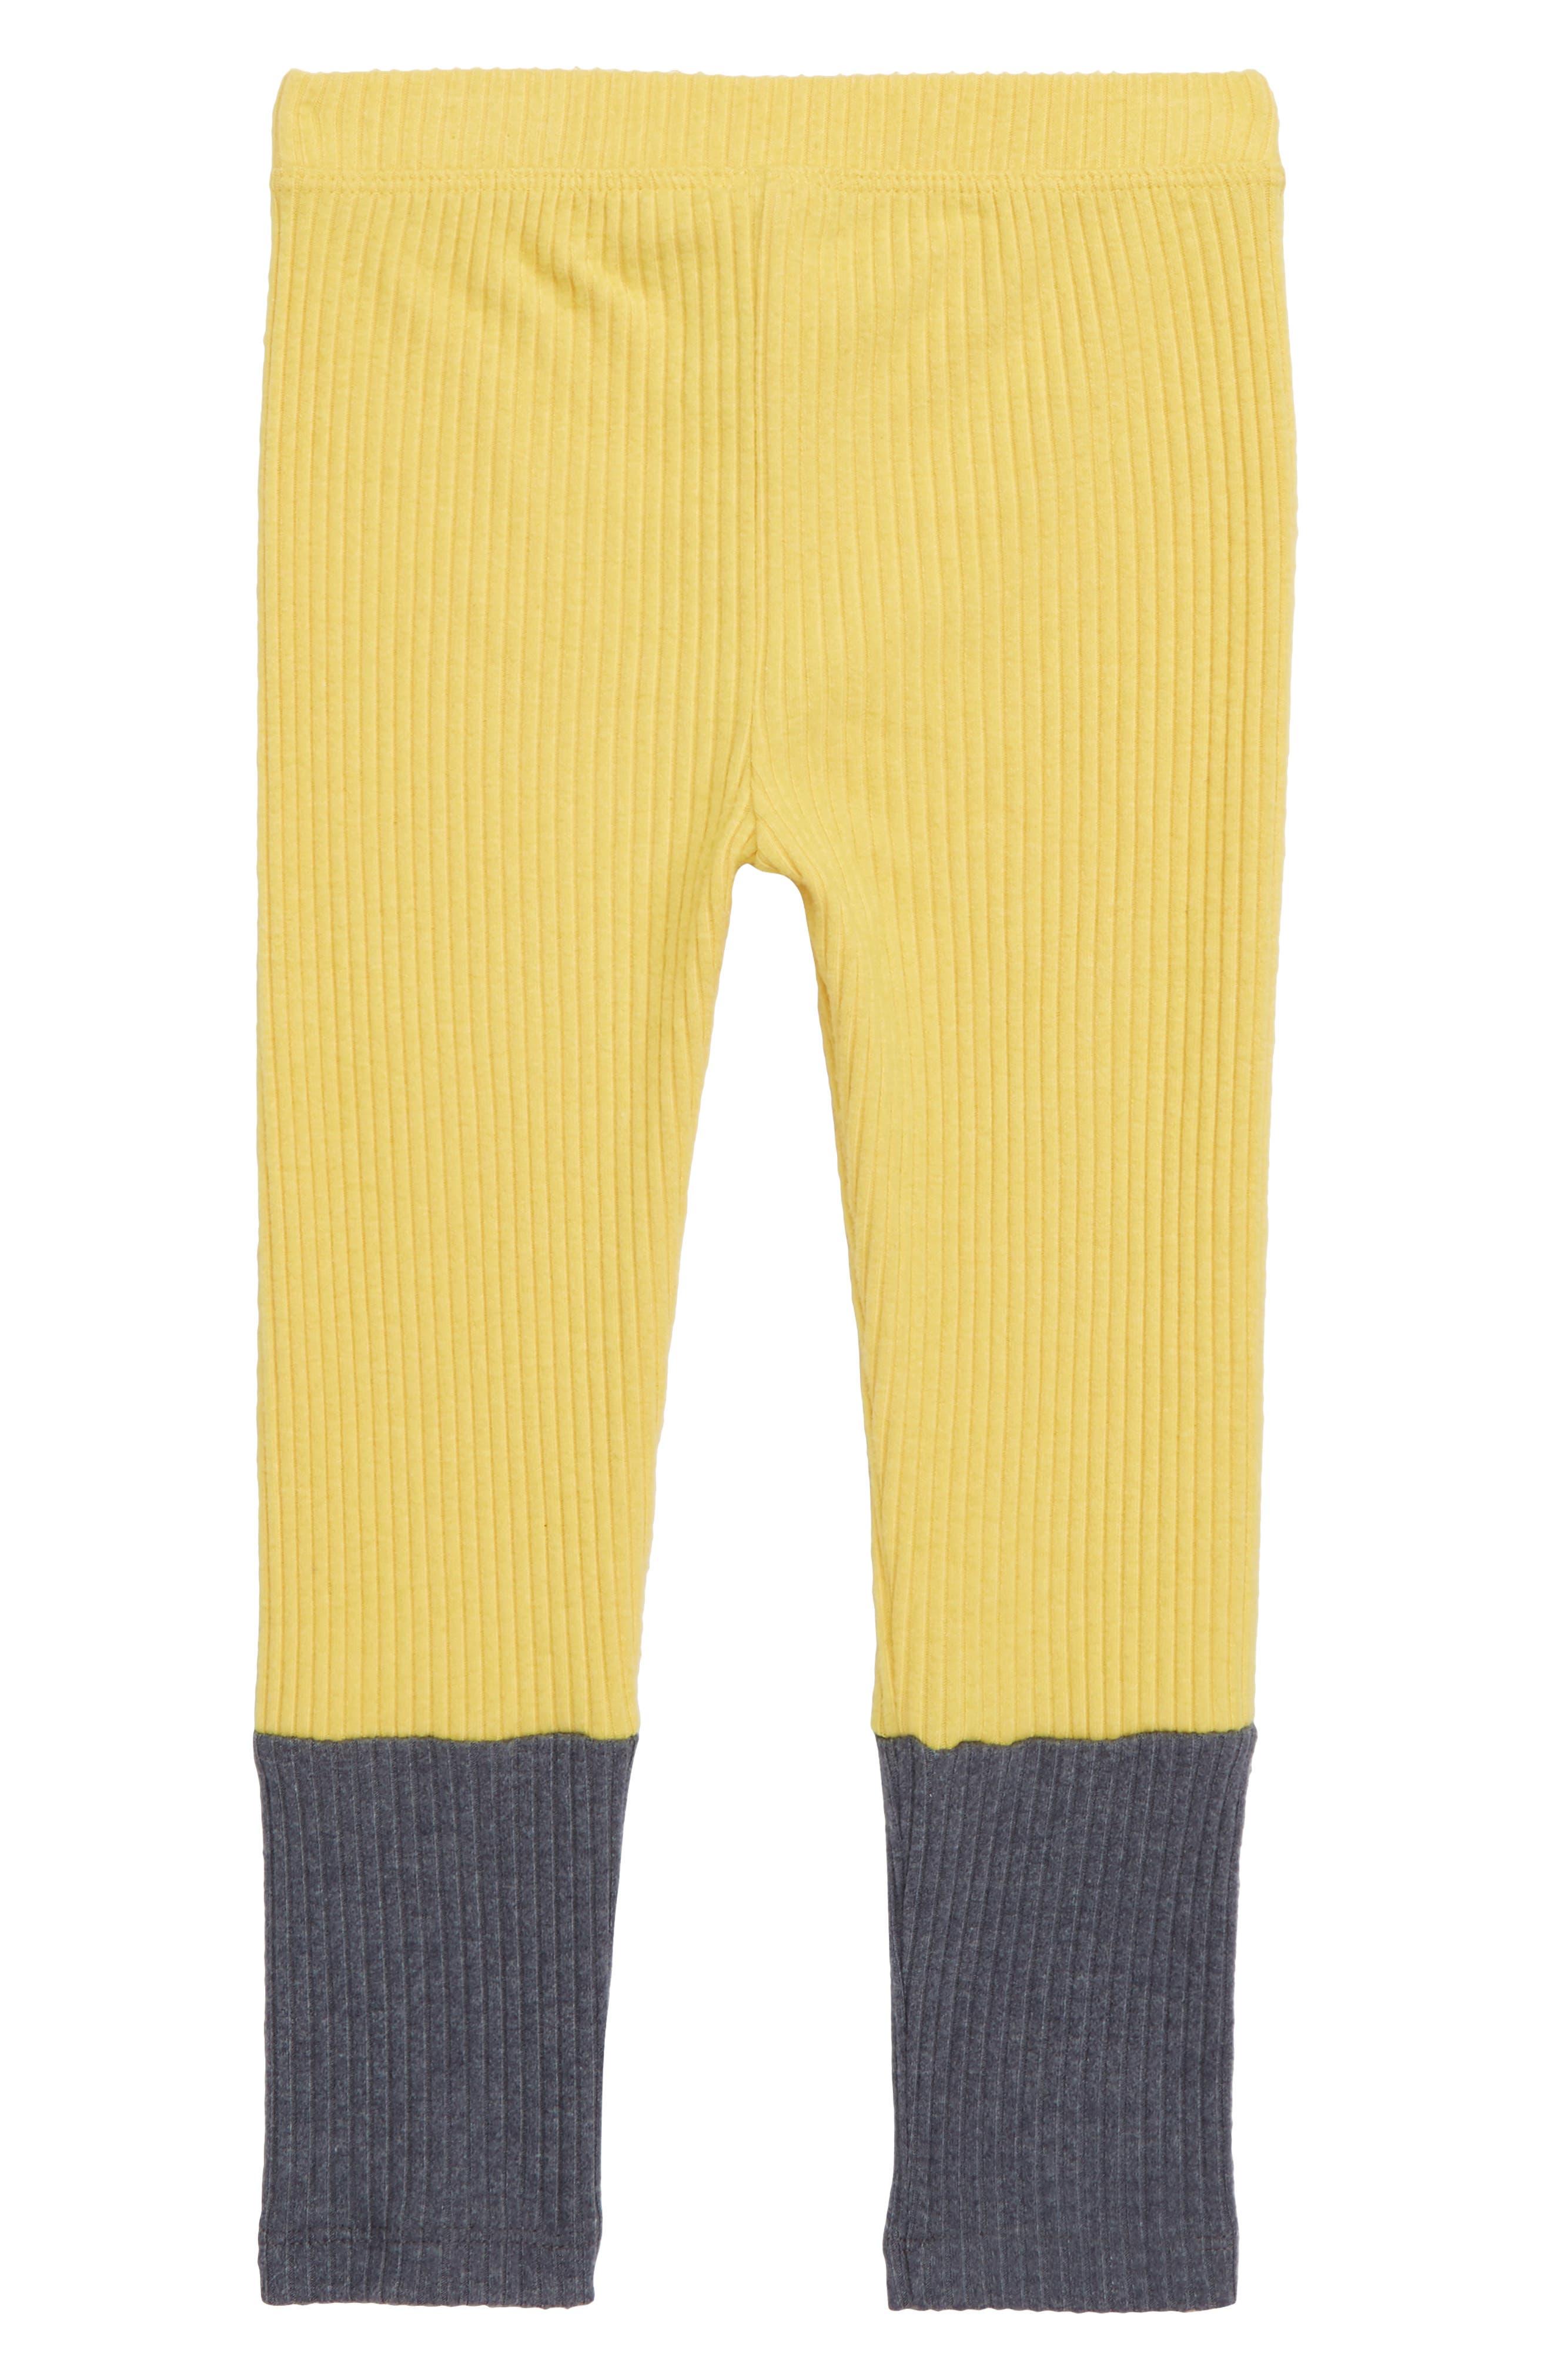 Colorblock Ribbed Leggings,                         Main,                         color, YELLOW BAMBOO- GREY